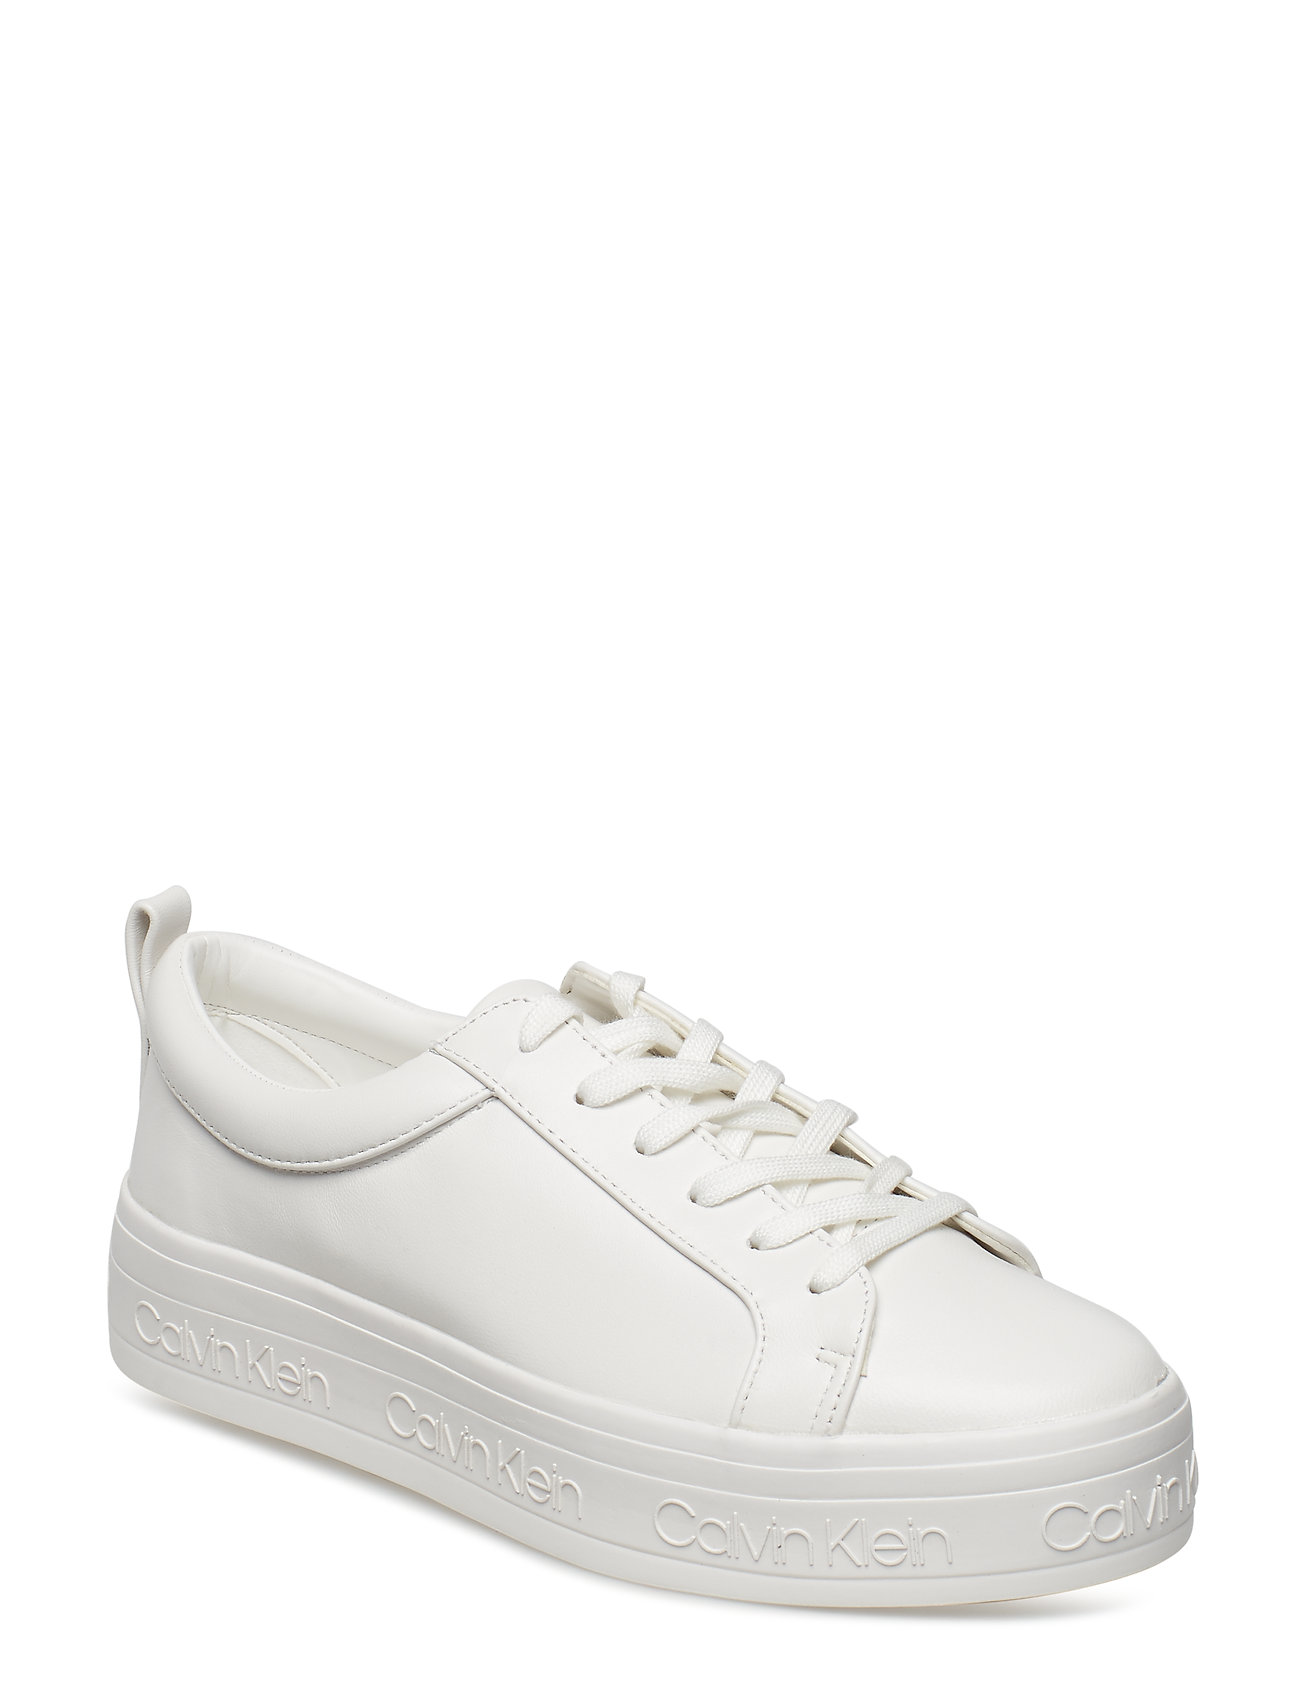 Calvin Klein Footwear JAELEE NAPPA - WHT